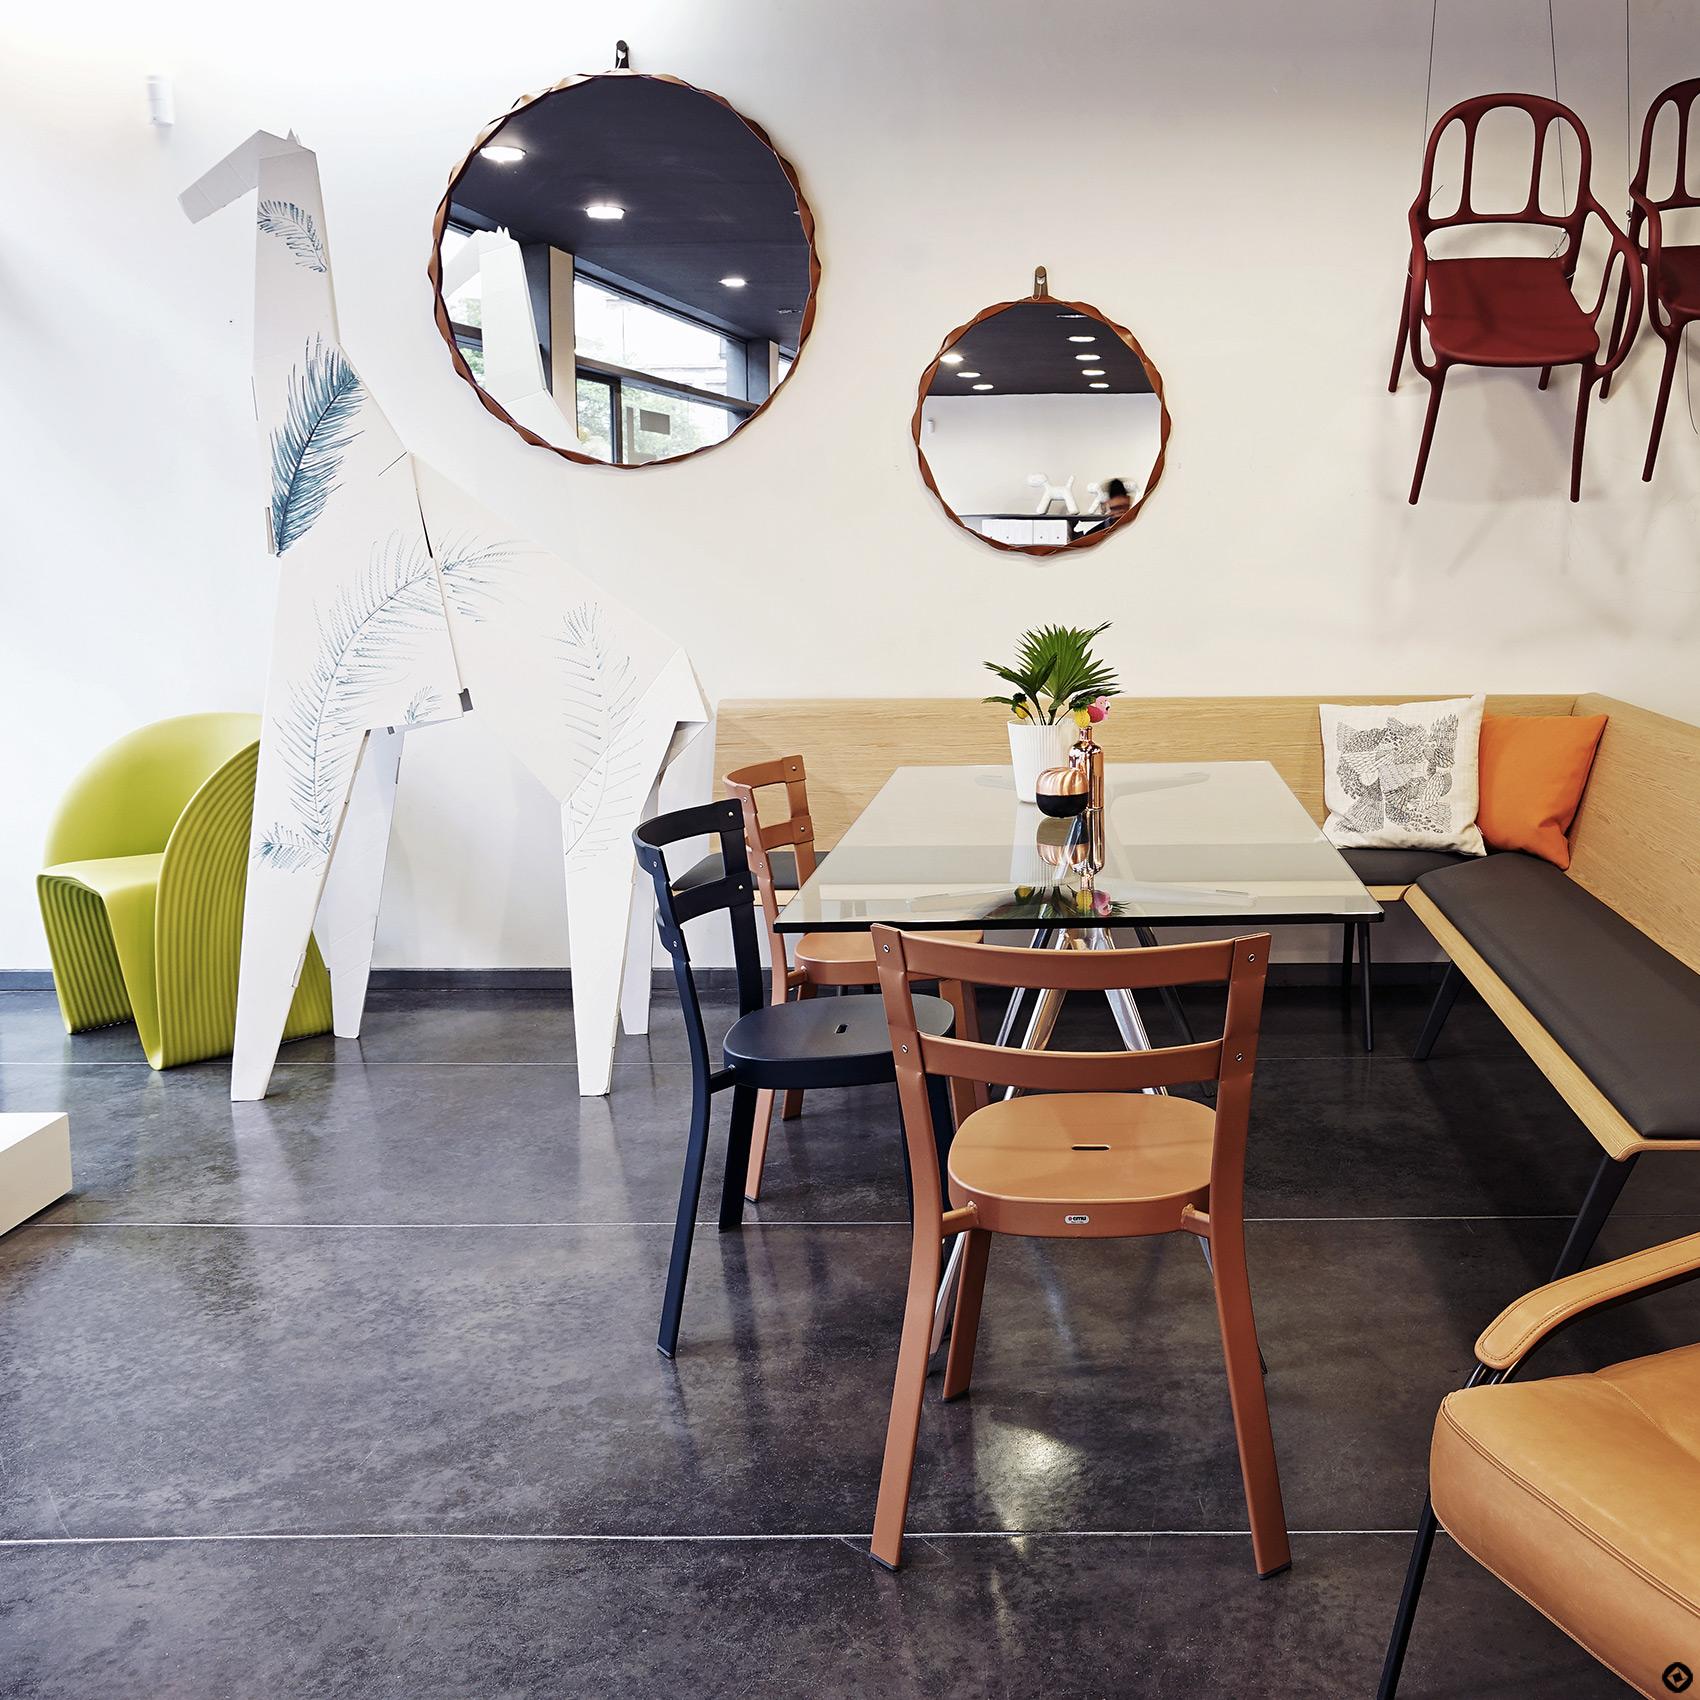 tendances outdoor edward mobilier marseille jo yana. Black Bedroom Furniture Sets. Home Design Ideas